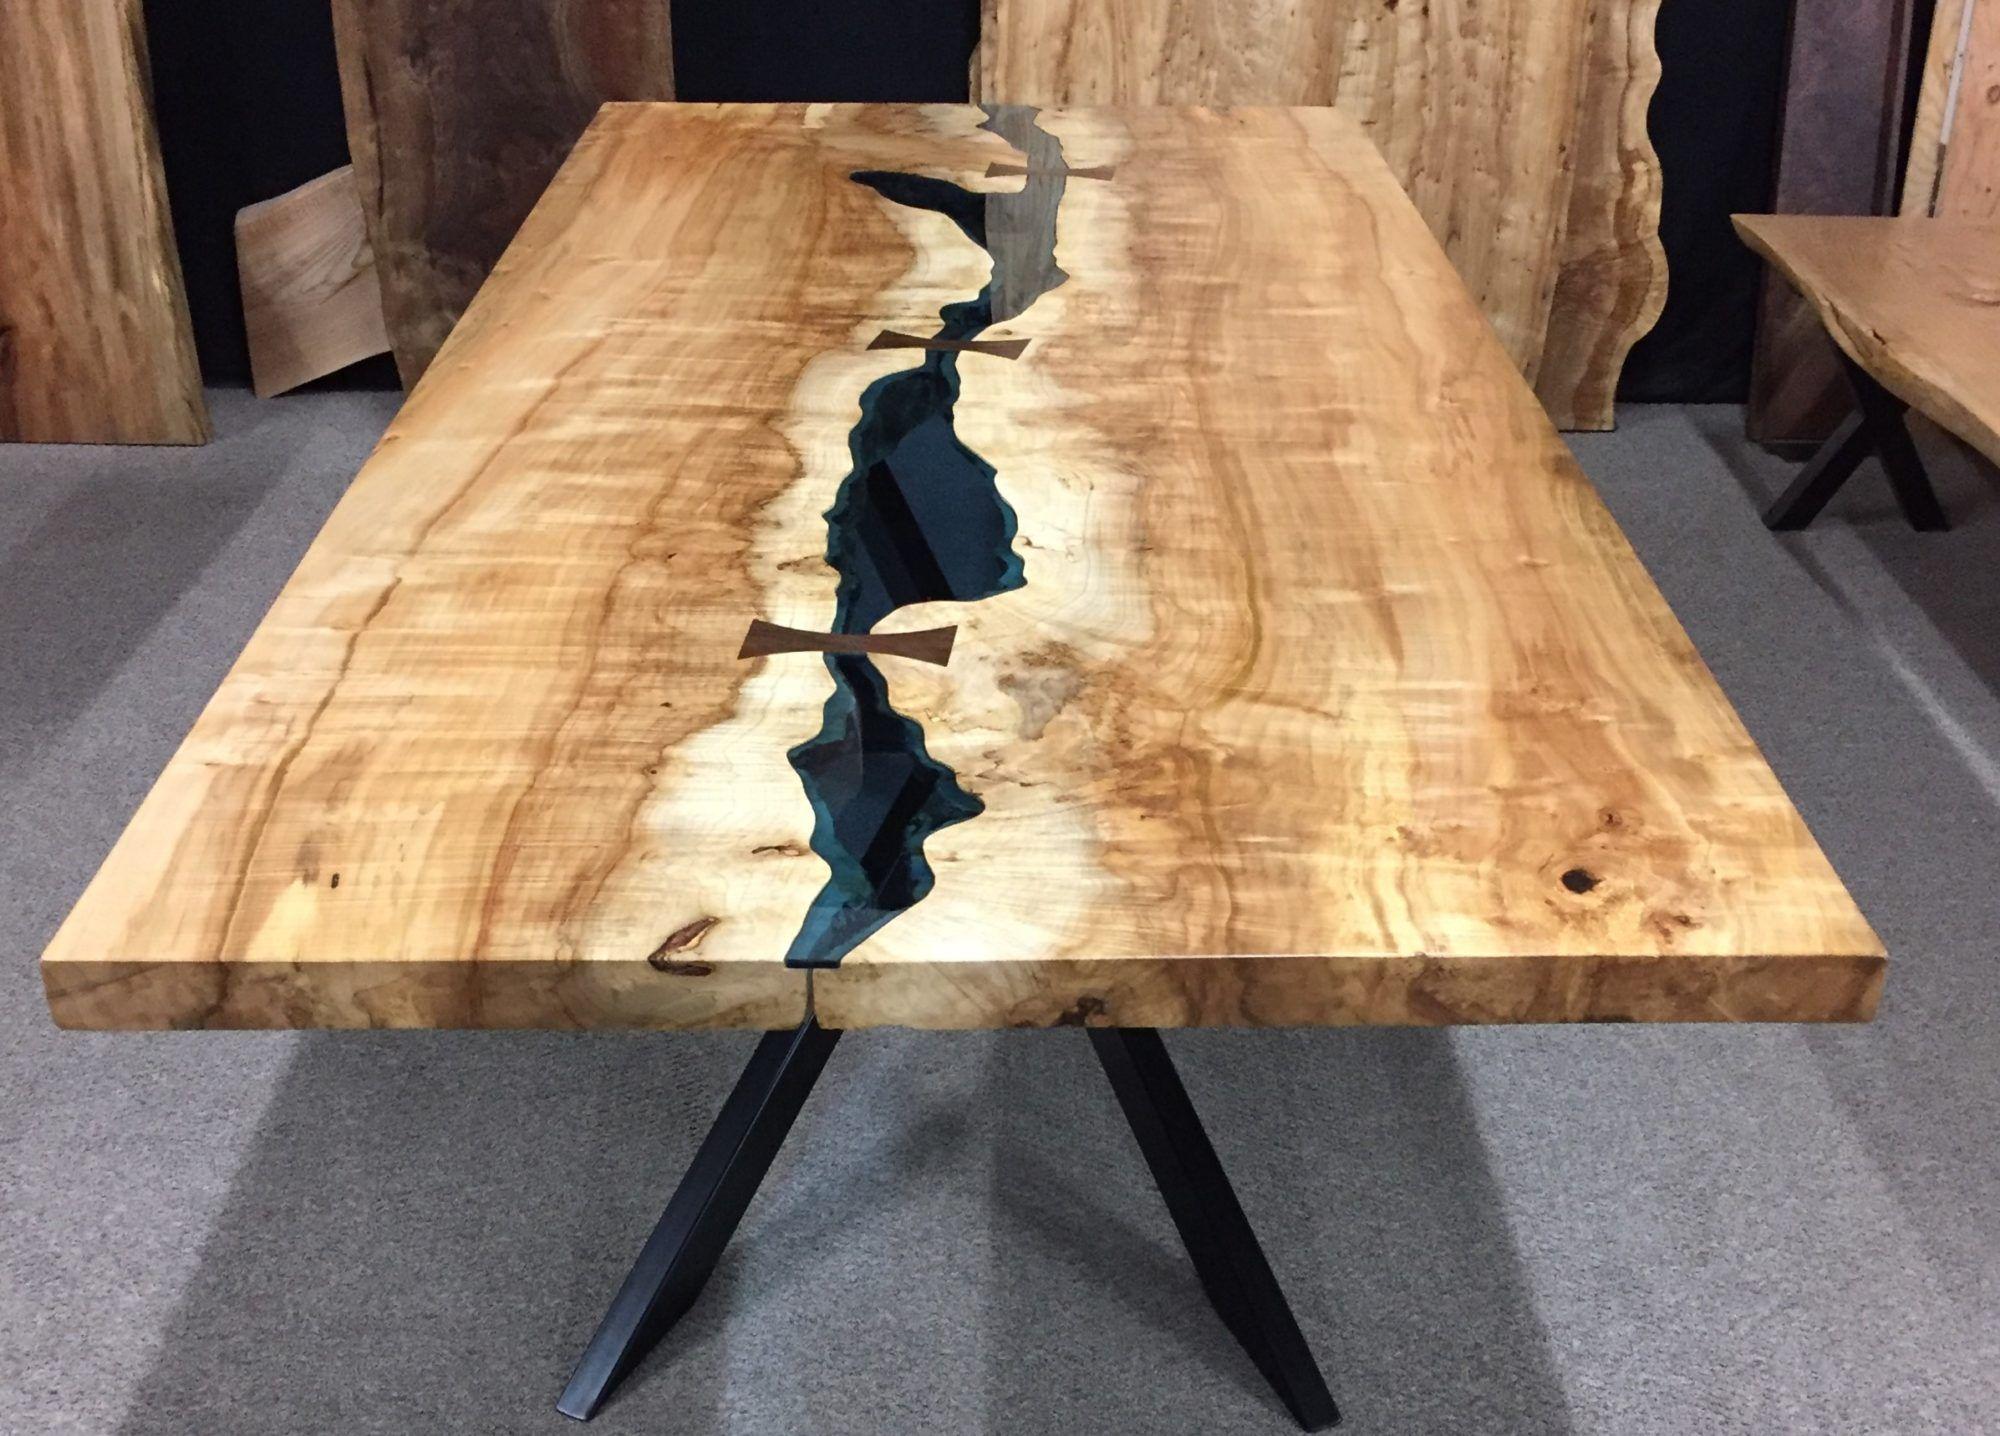 Our expert craftsmen build custom designed solid wood furniture from